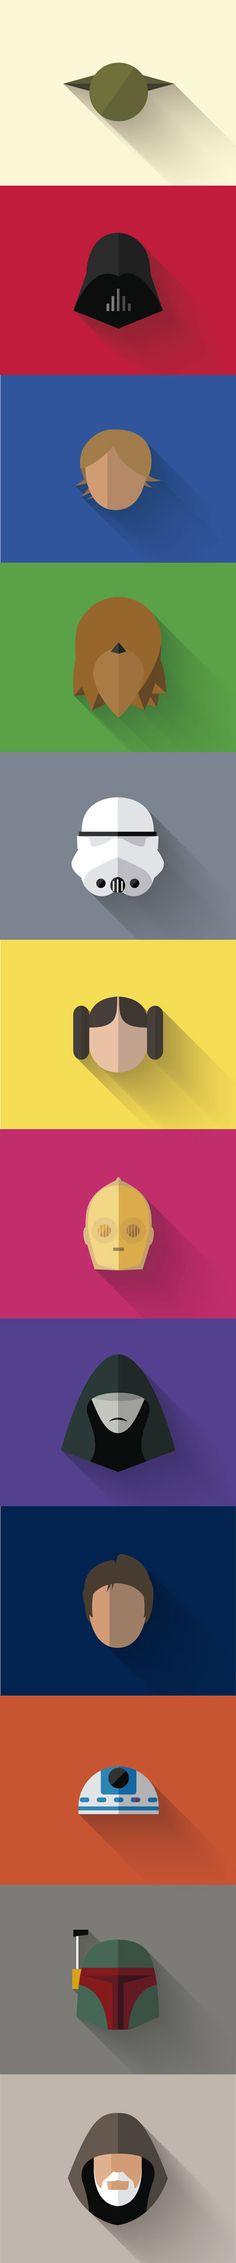 A #colorful #great #starwars #flatdesign #longshadow icons series by Filipe Carvalho.